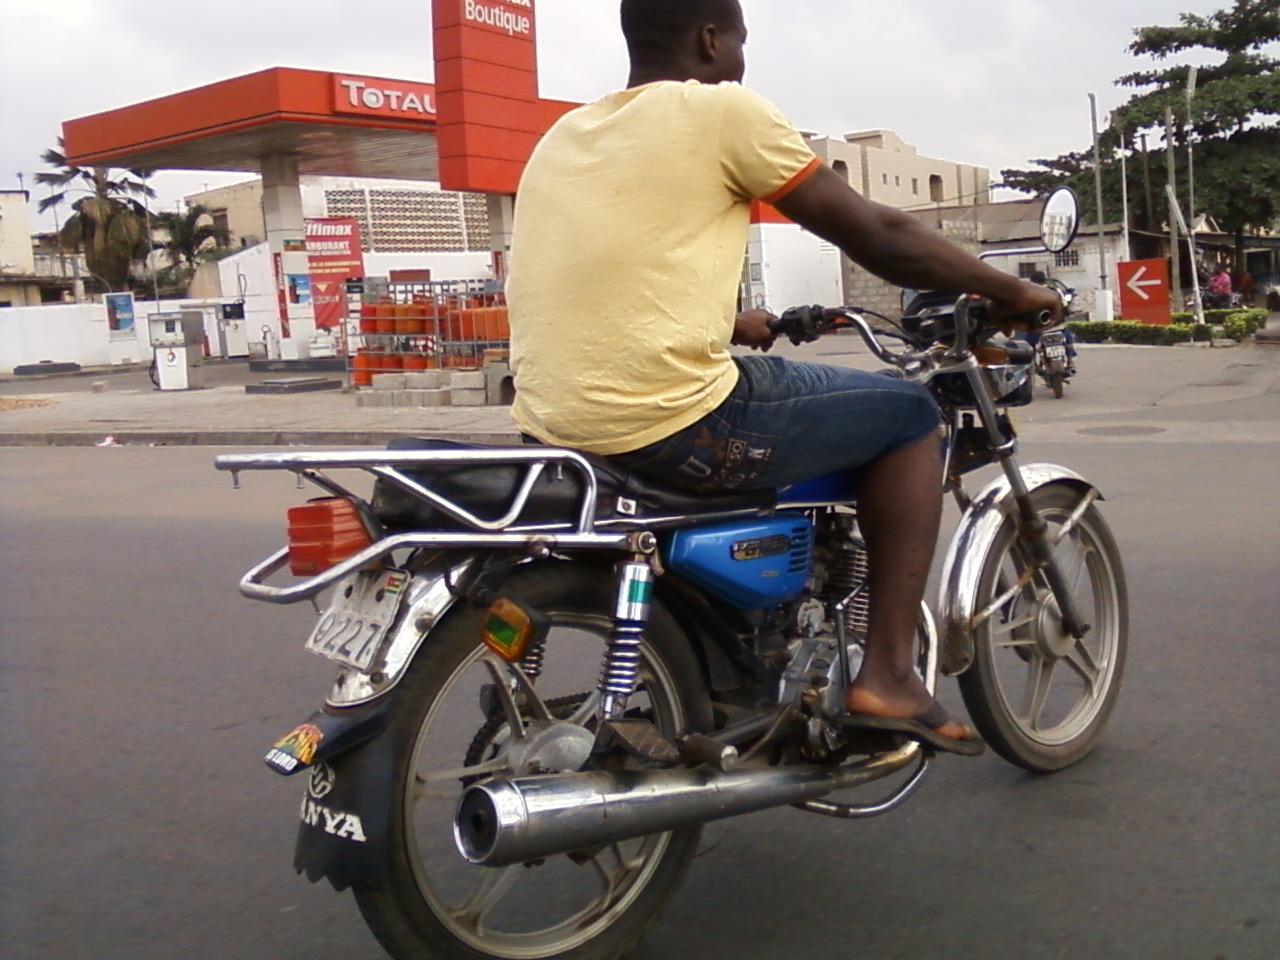 Moto_taxi_Lomé_Togo_photo_aristides_honyiglo